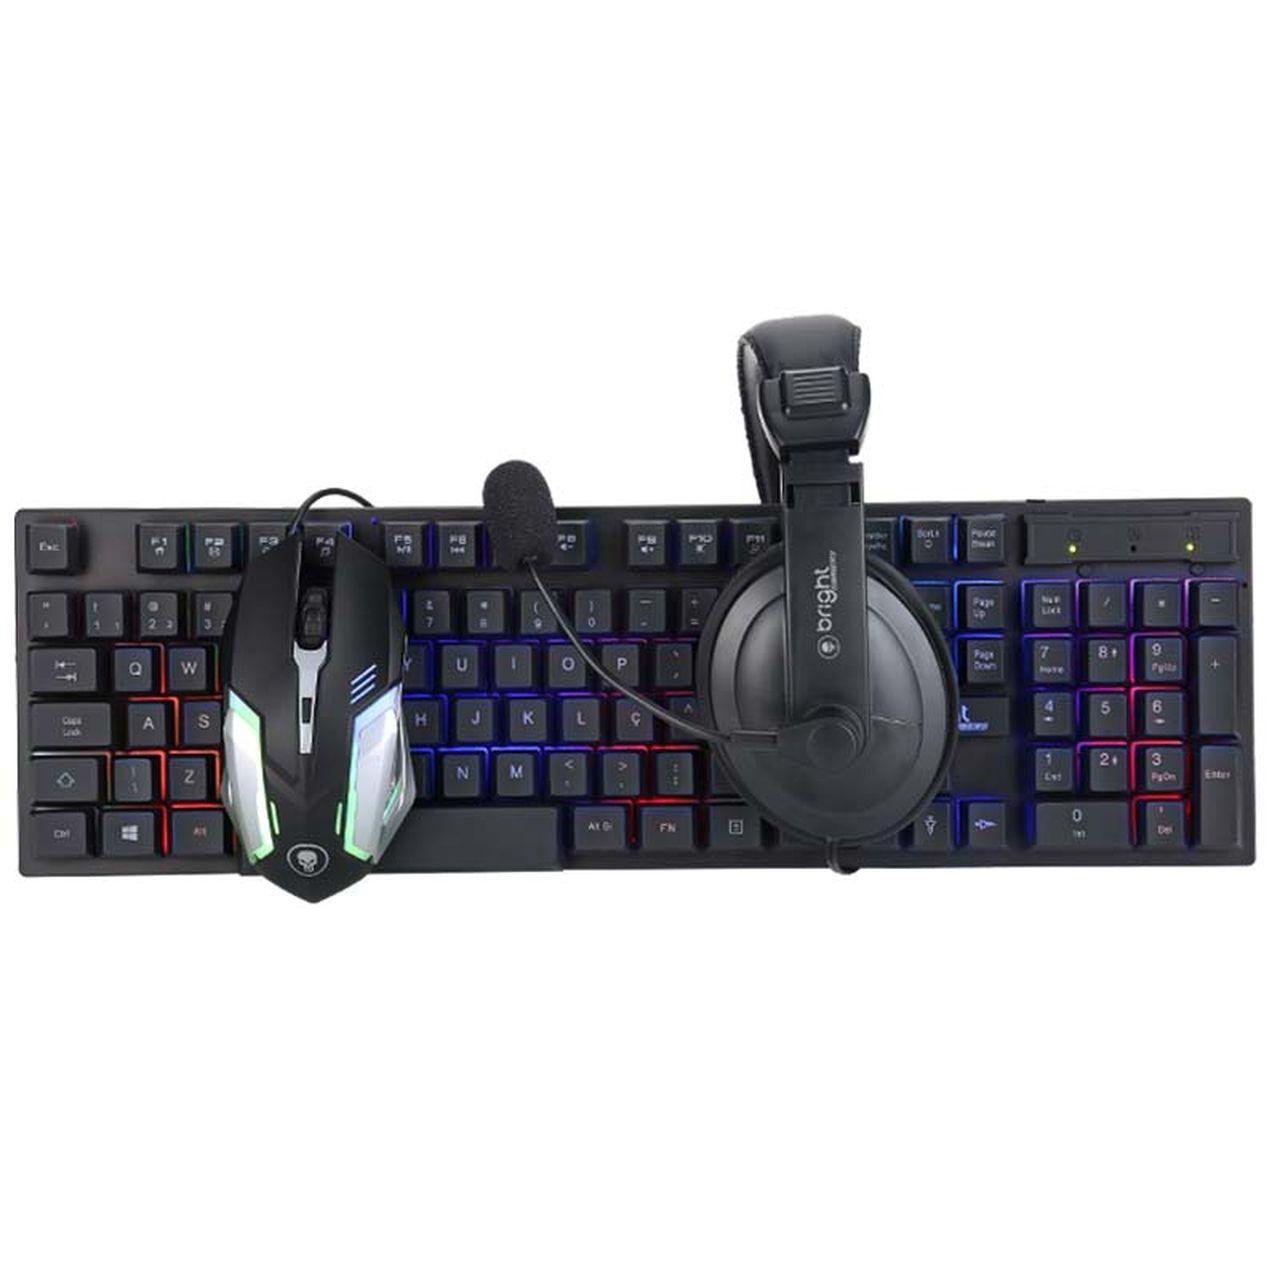 Combo Gamer Teclado Mouse e Fone de Ouvido Headset 543 - Bright